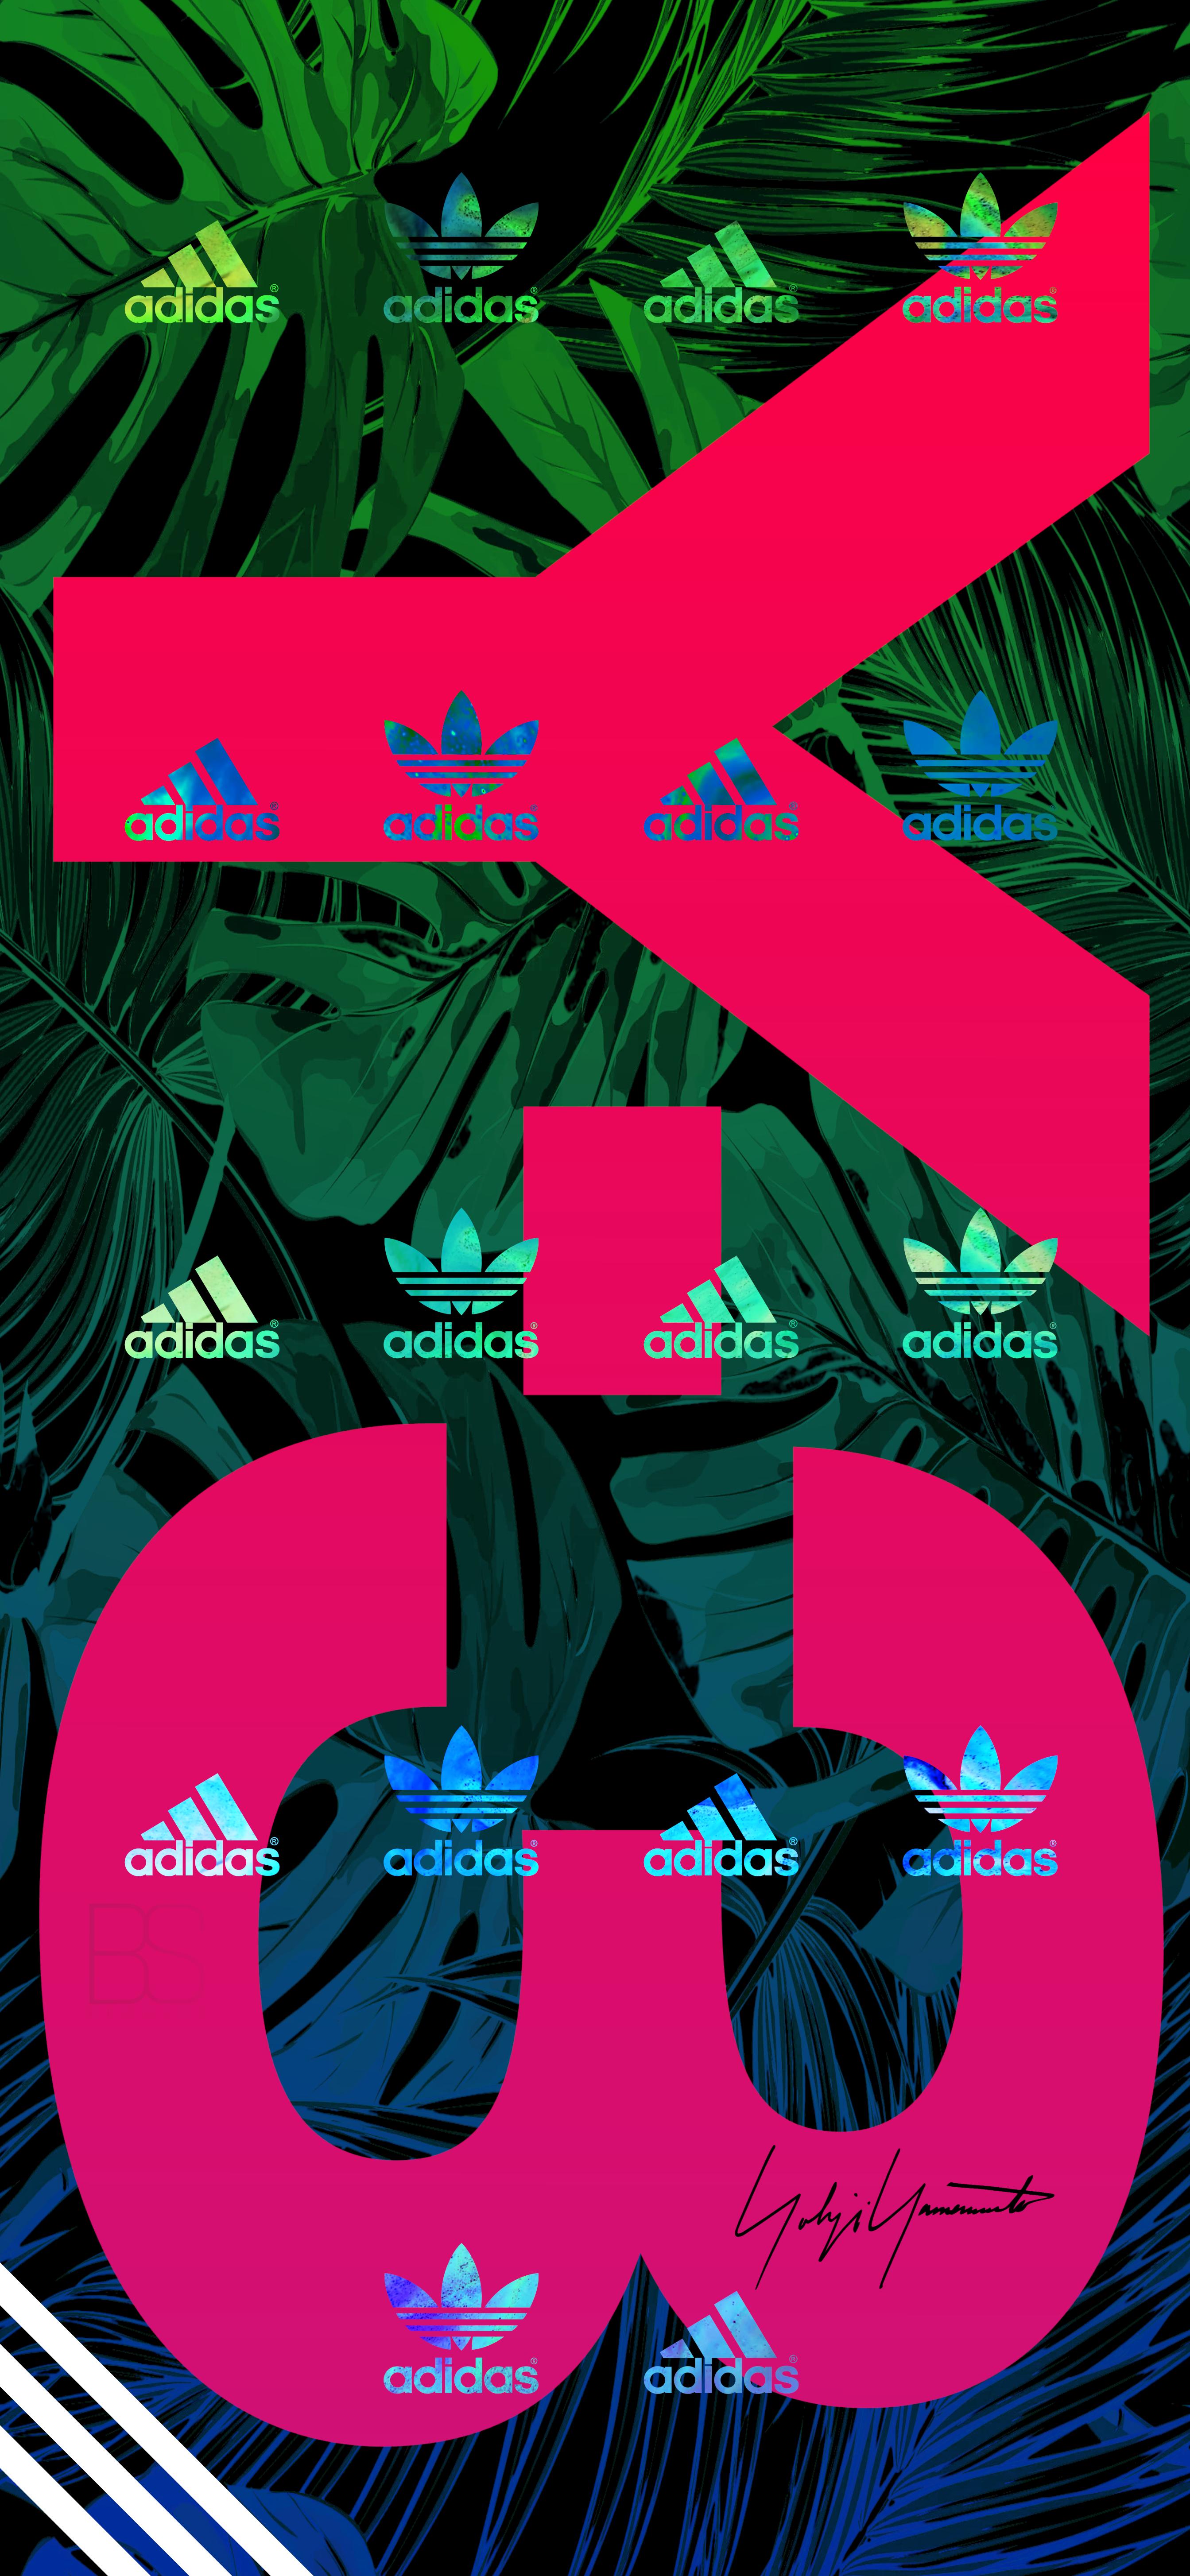 Adidas iPhone X Series Wallpaper 배경화면